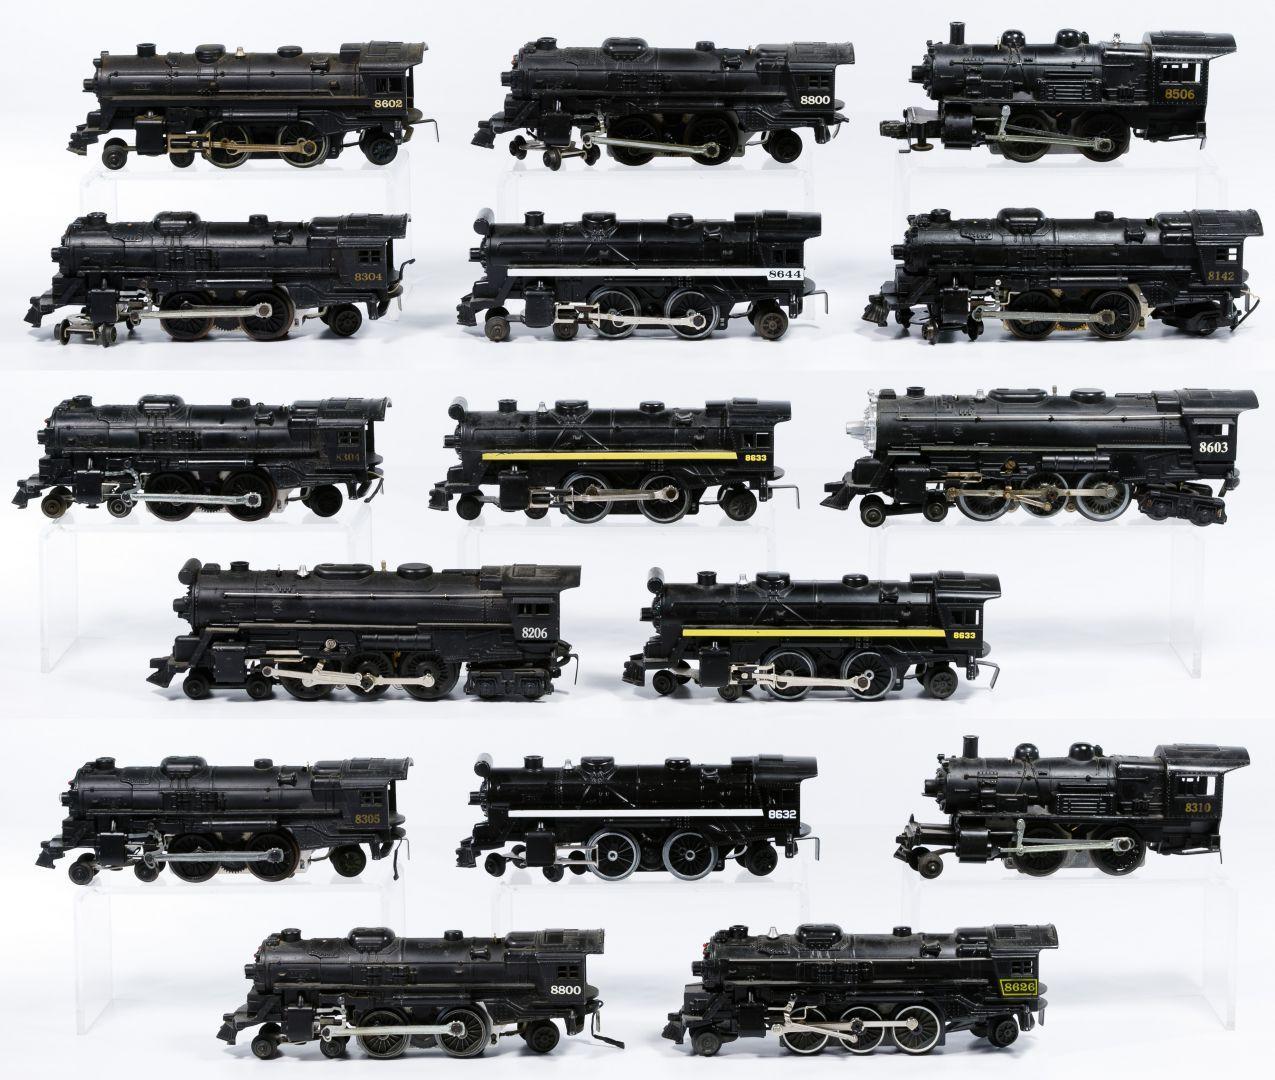 Lot 232 Lionel Model Train Engine Assortment Sixteen Trains Including 8142 8206 Two 8304 8305 8310 8506 8602 860 Model Trains Train Locomotive